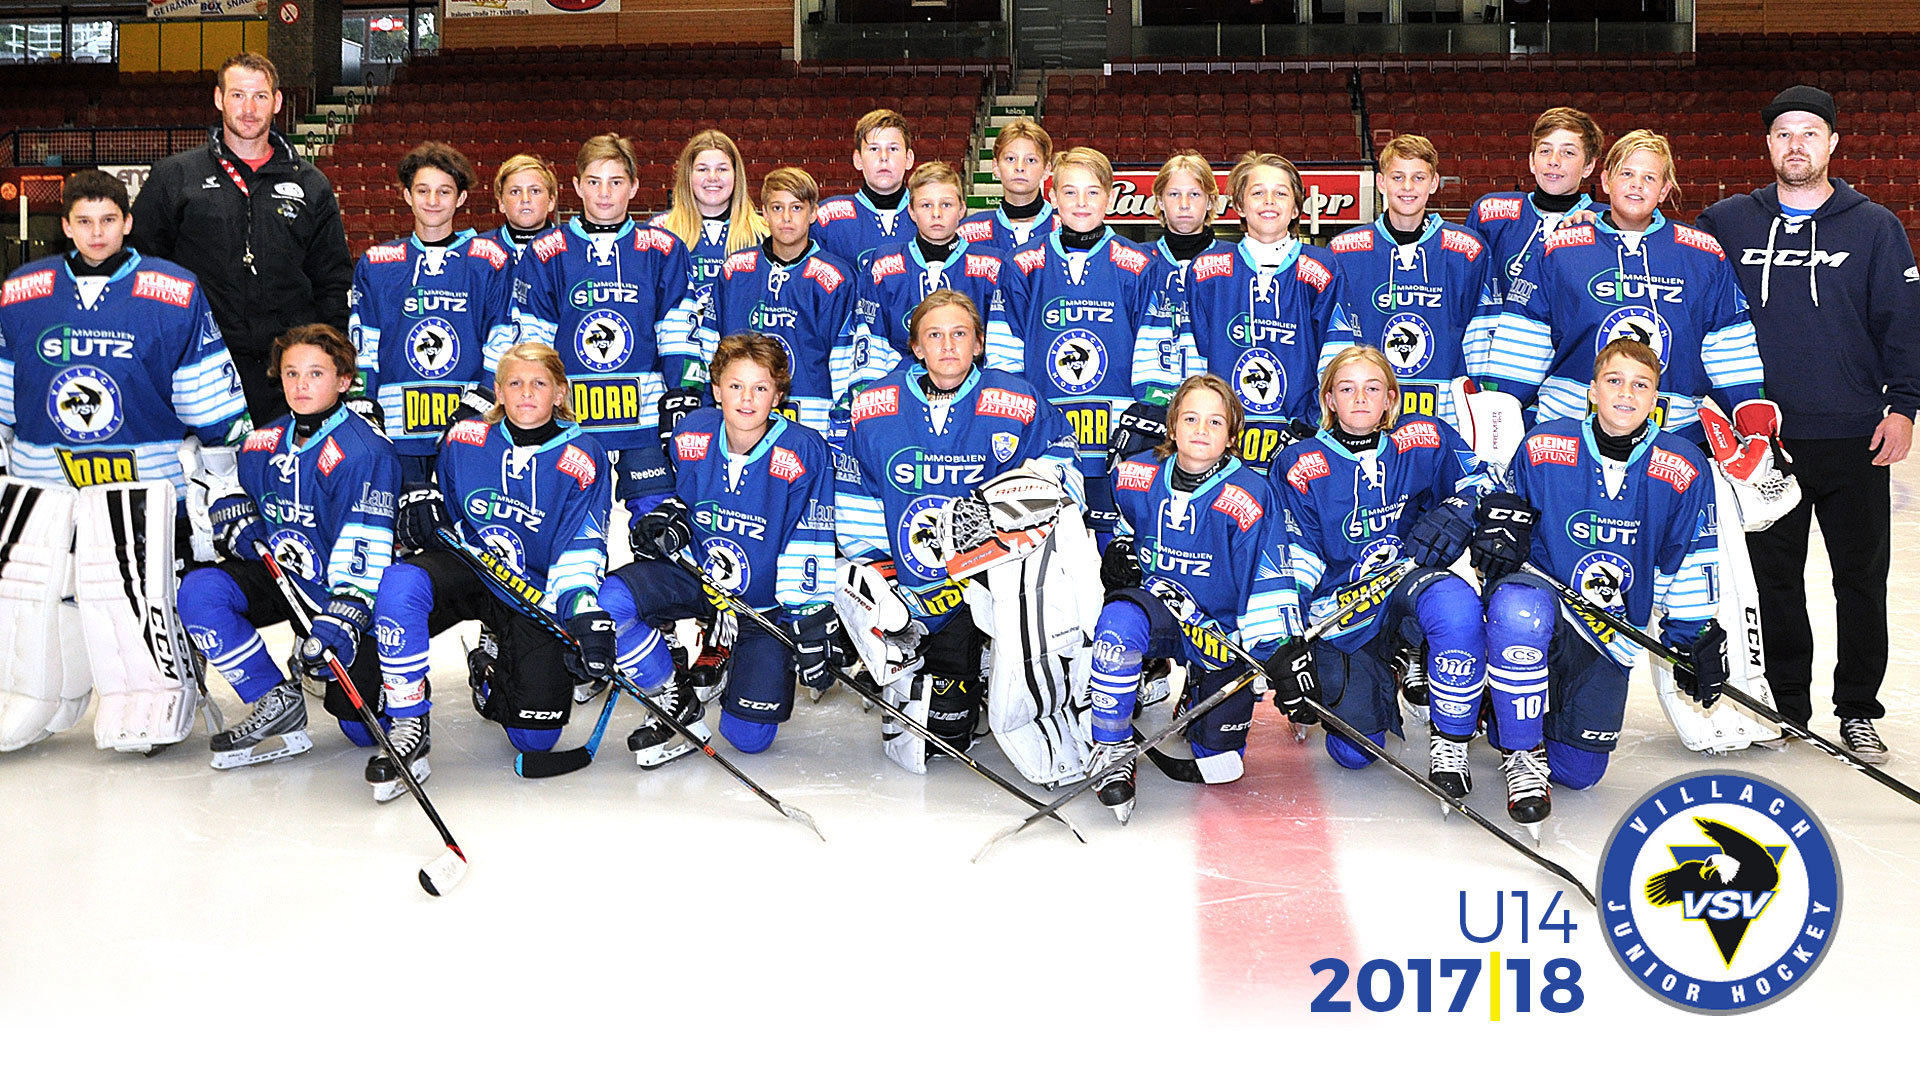 Photo of U14 Finalturnier 2017/18